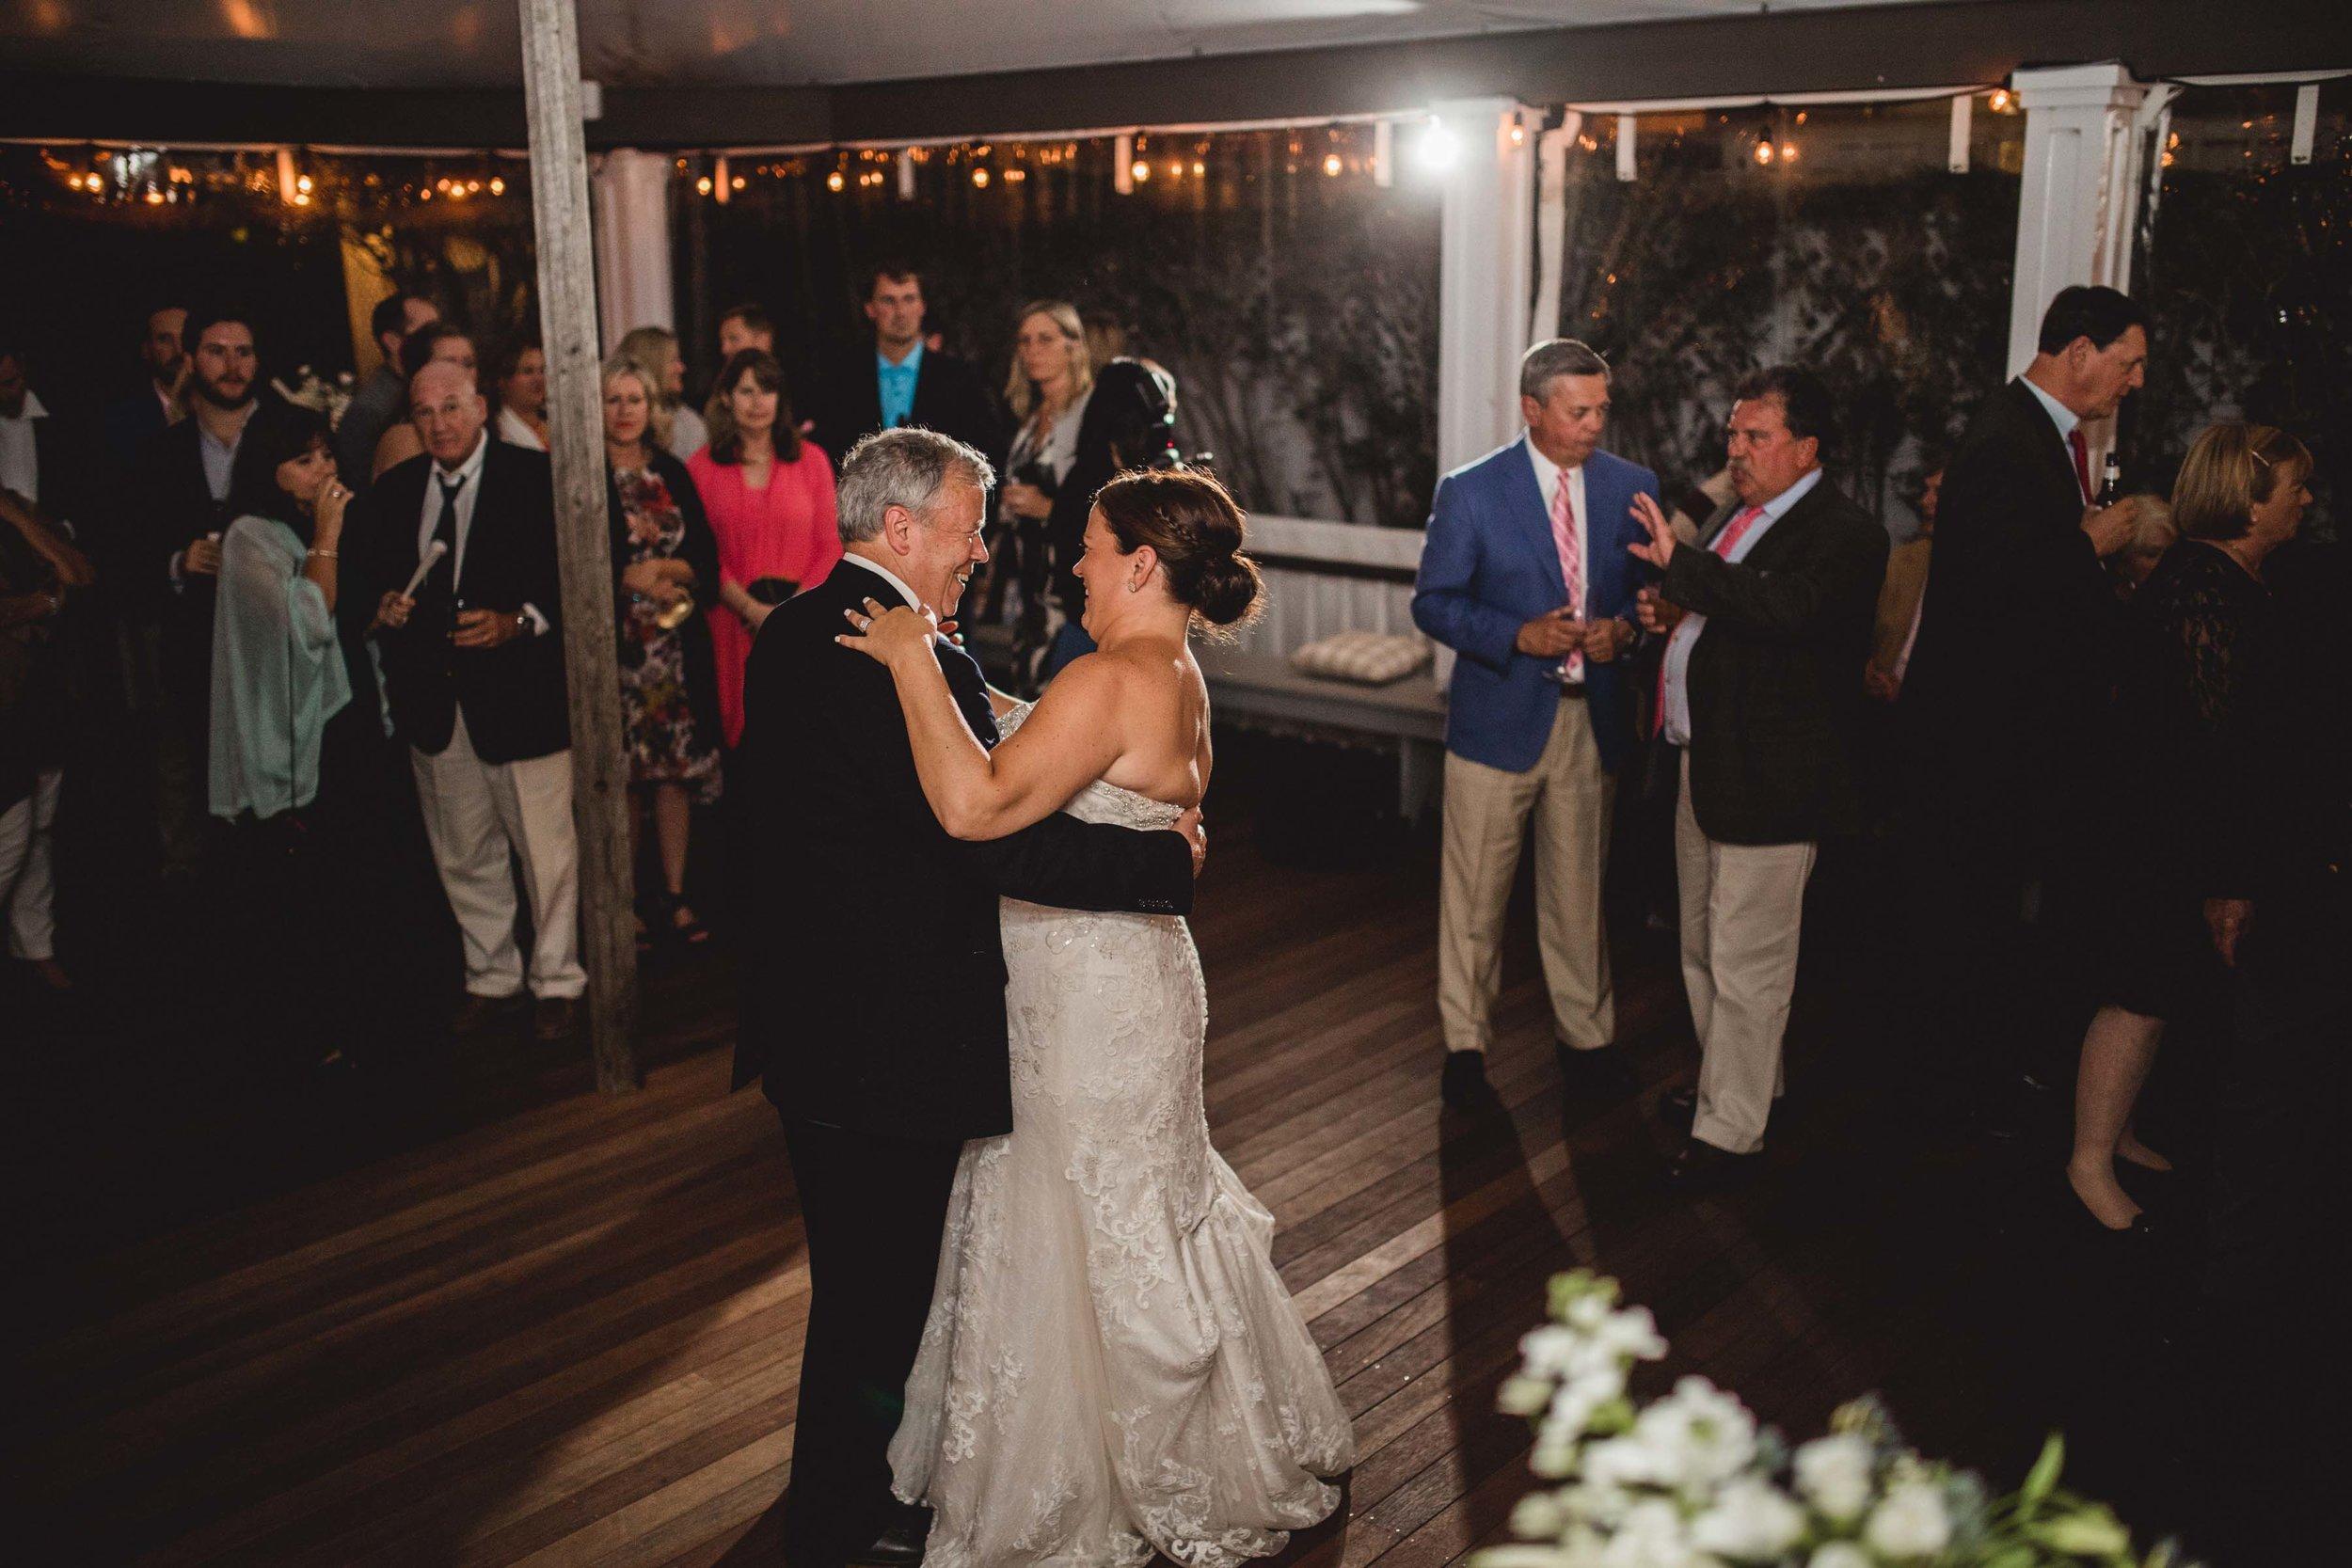 Marthas-vineyard-wedding-2-2.jpg